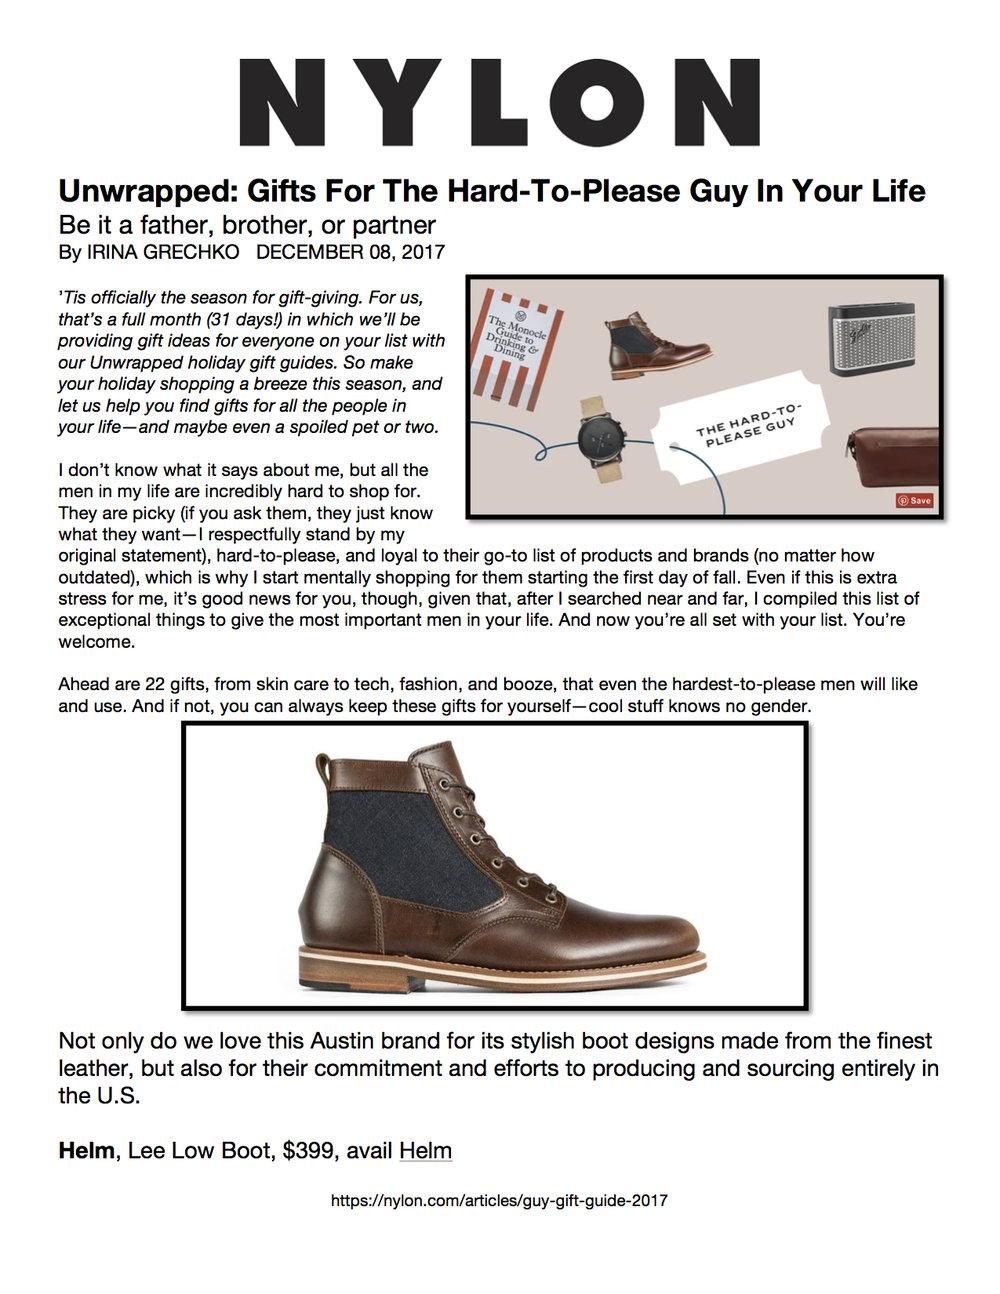 Helm nylon gift guide for the hard to please guy di moda pr solutioingenieria Choice Image